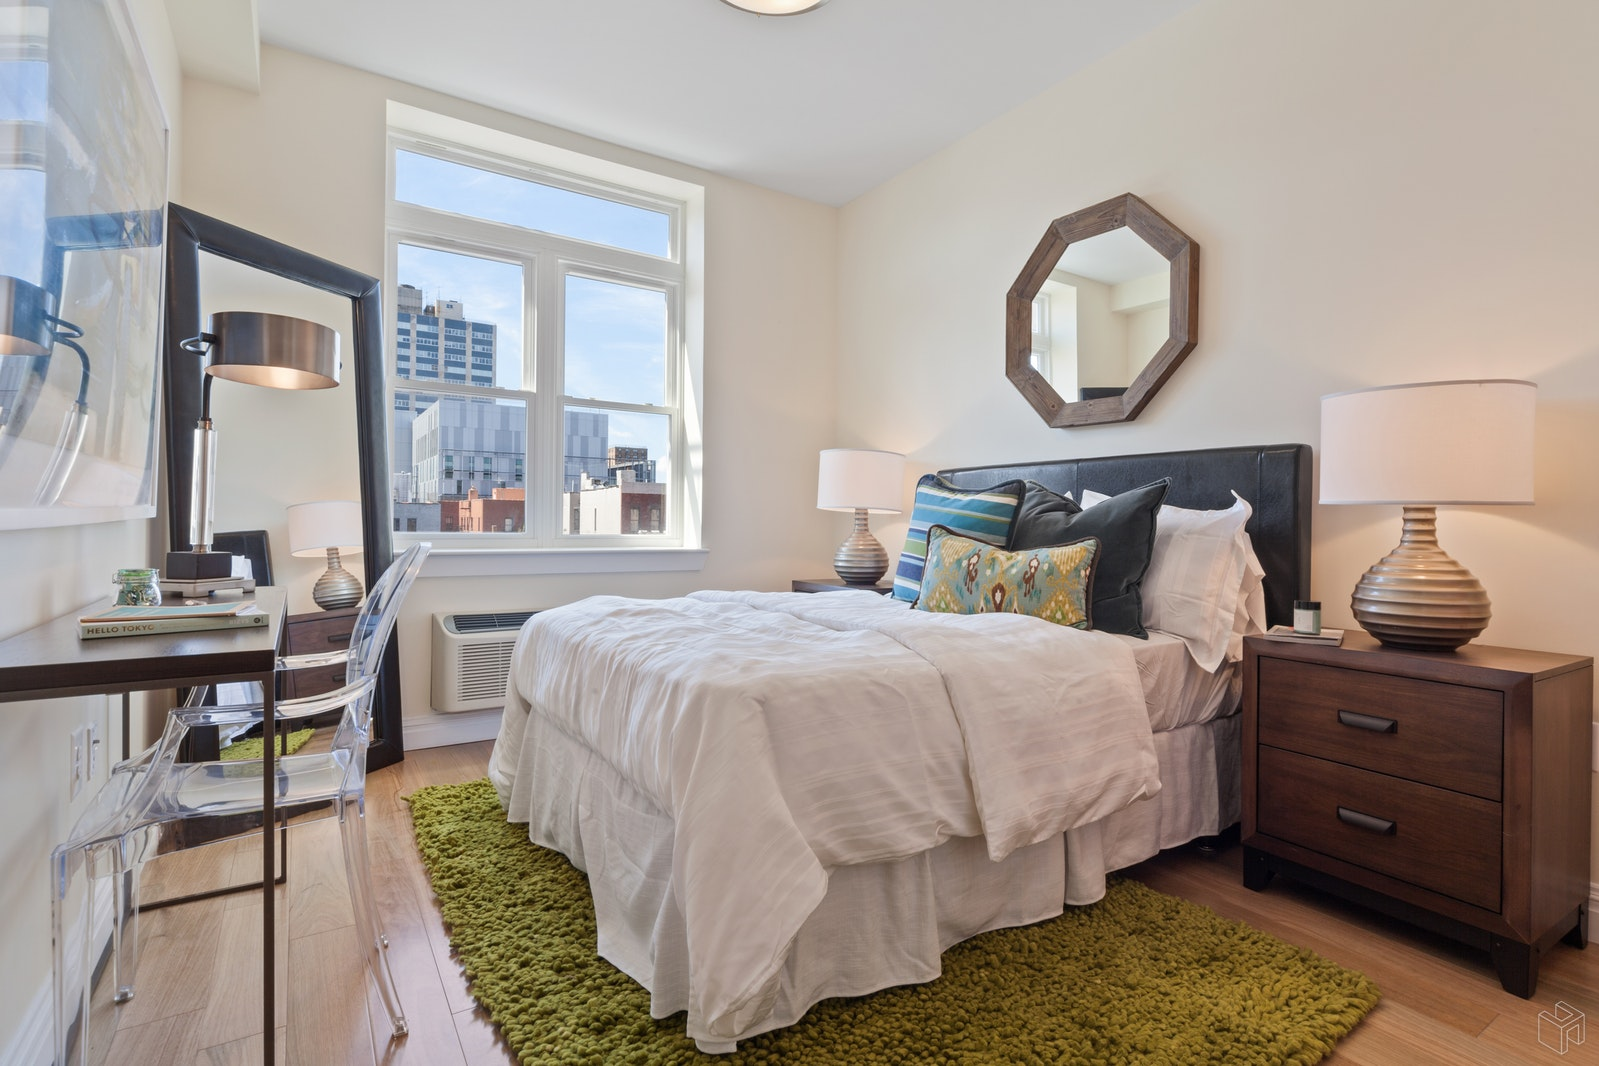 70 WEST 139TH STREET 1B, Central Harlem, $895,000, Web #: 18407098